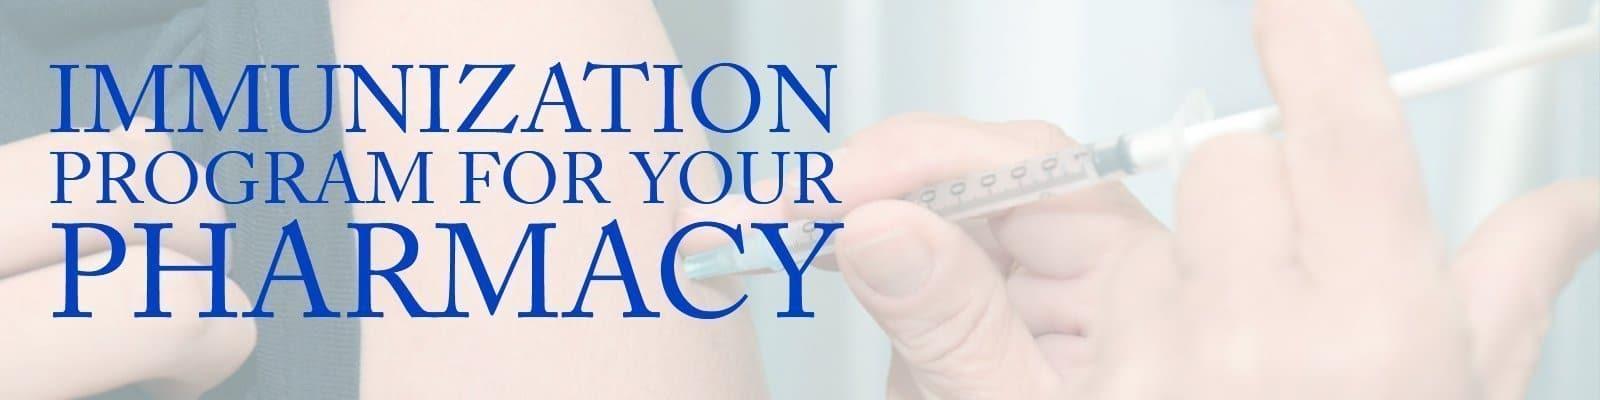 pharrmacy immunization program, start immunizations in my pharmacy, independent pharmacy consulting, keep my pharmacy competitive